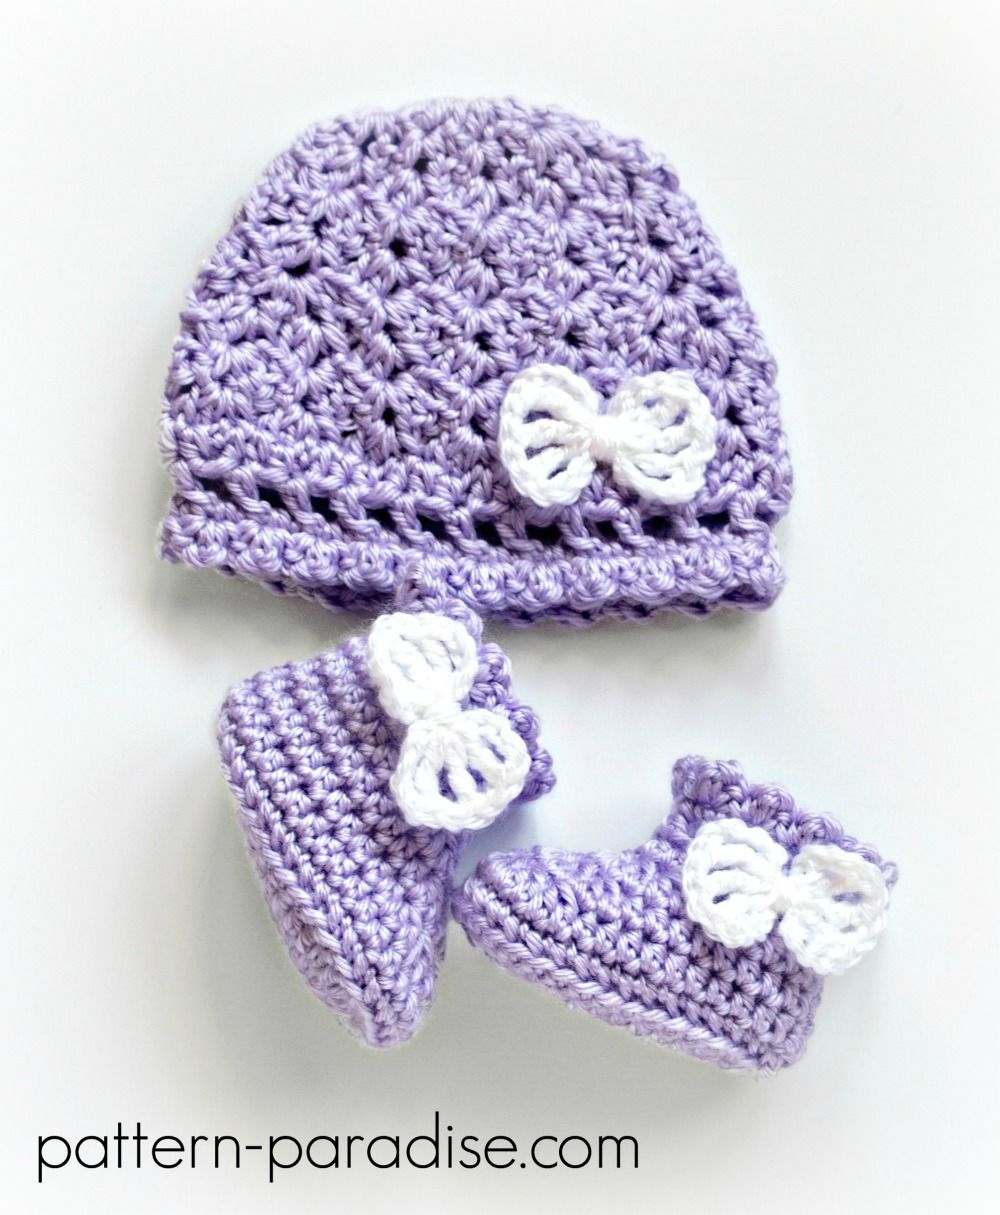 Crochet Pattern: Georgie Hat and Booties Set   Mochilas y Ganchillo